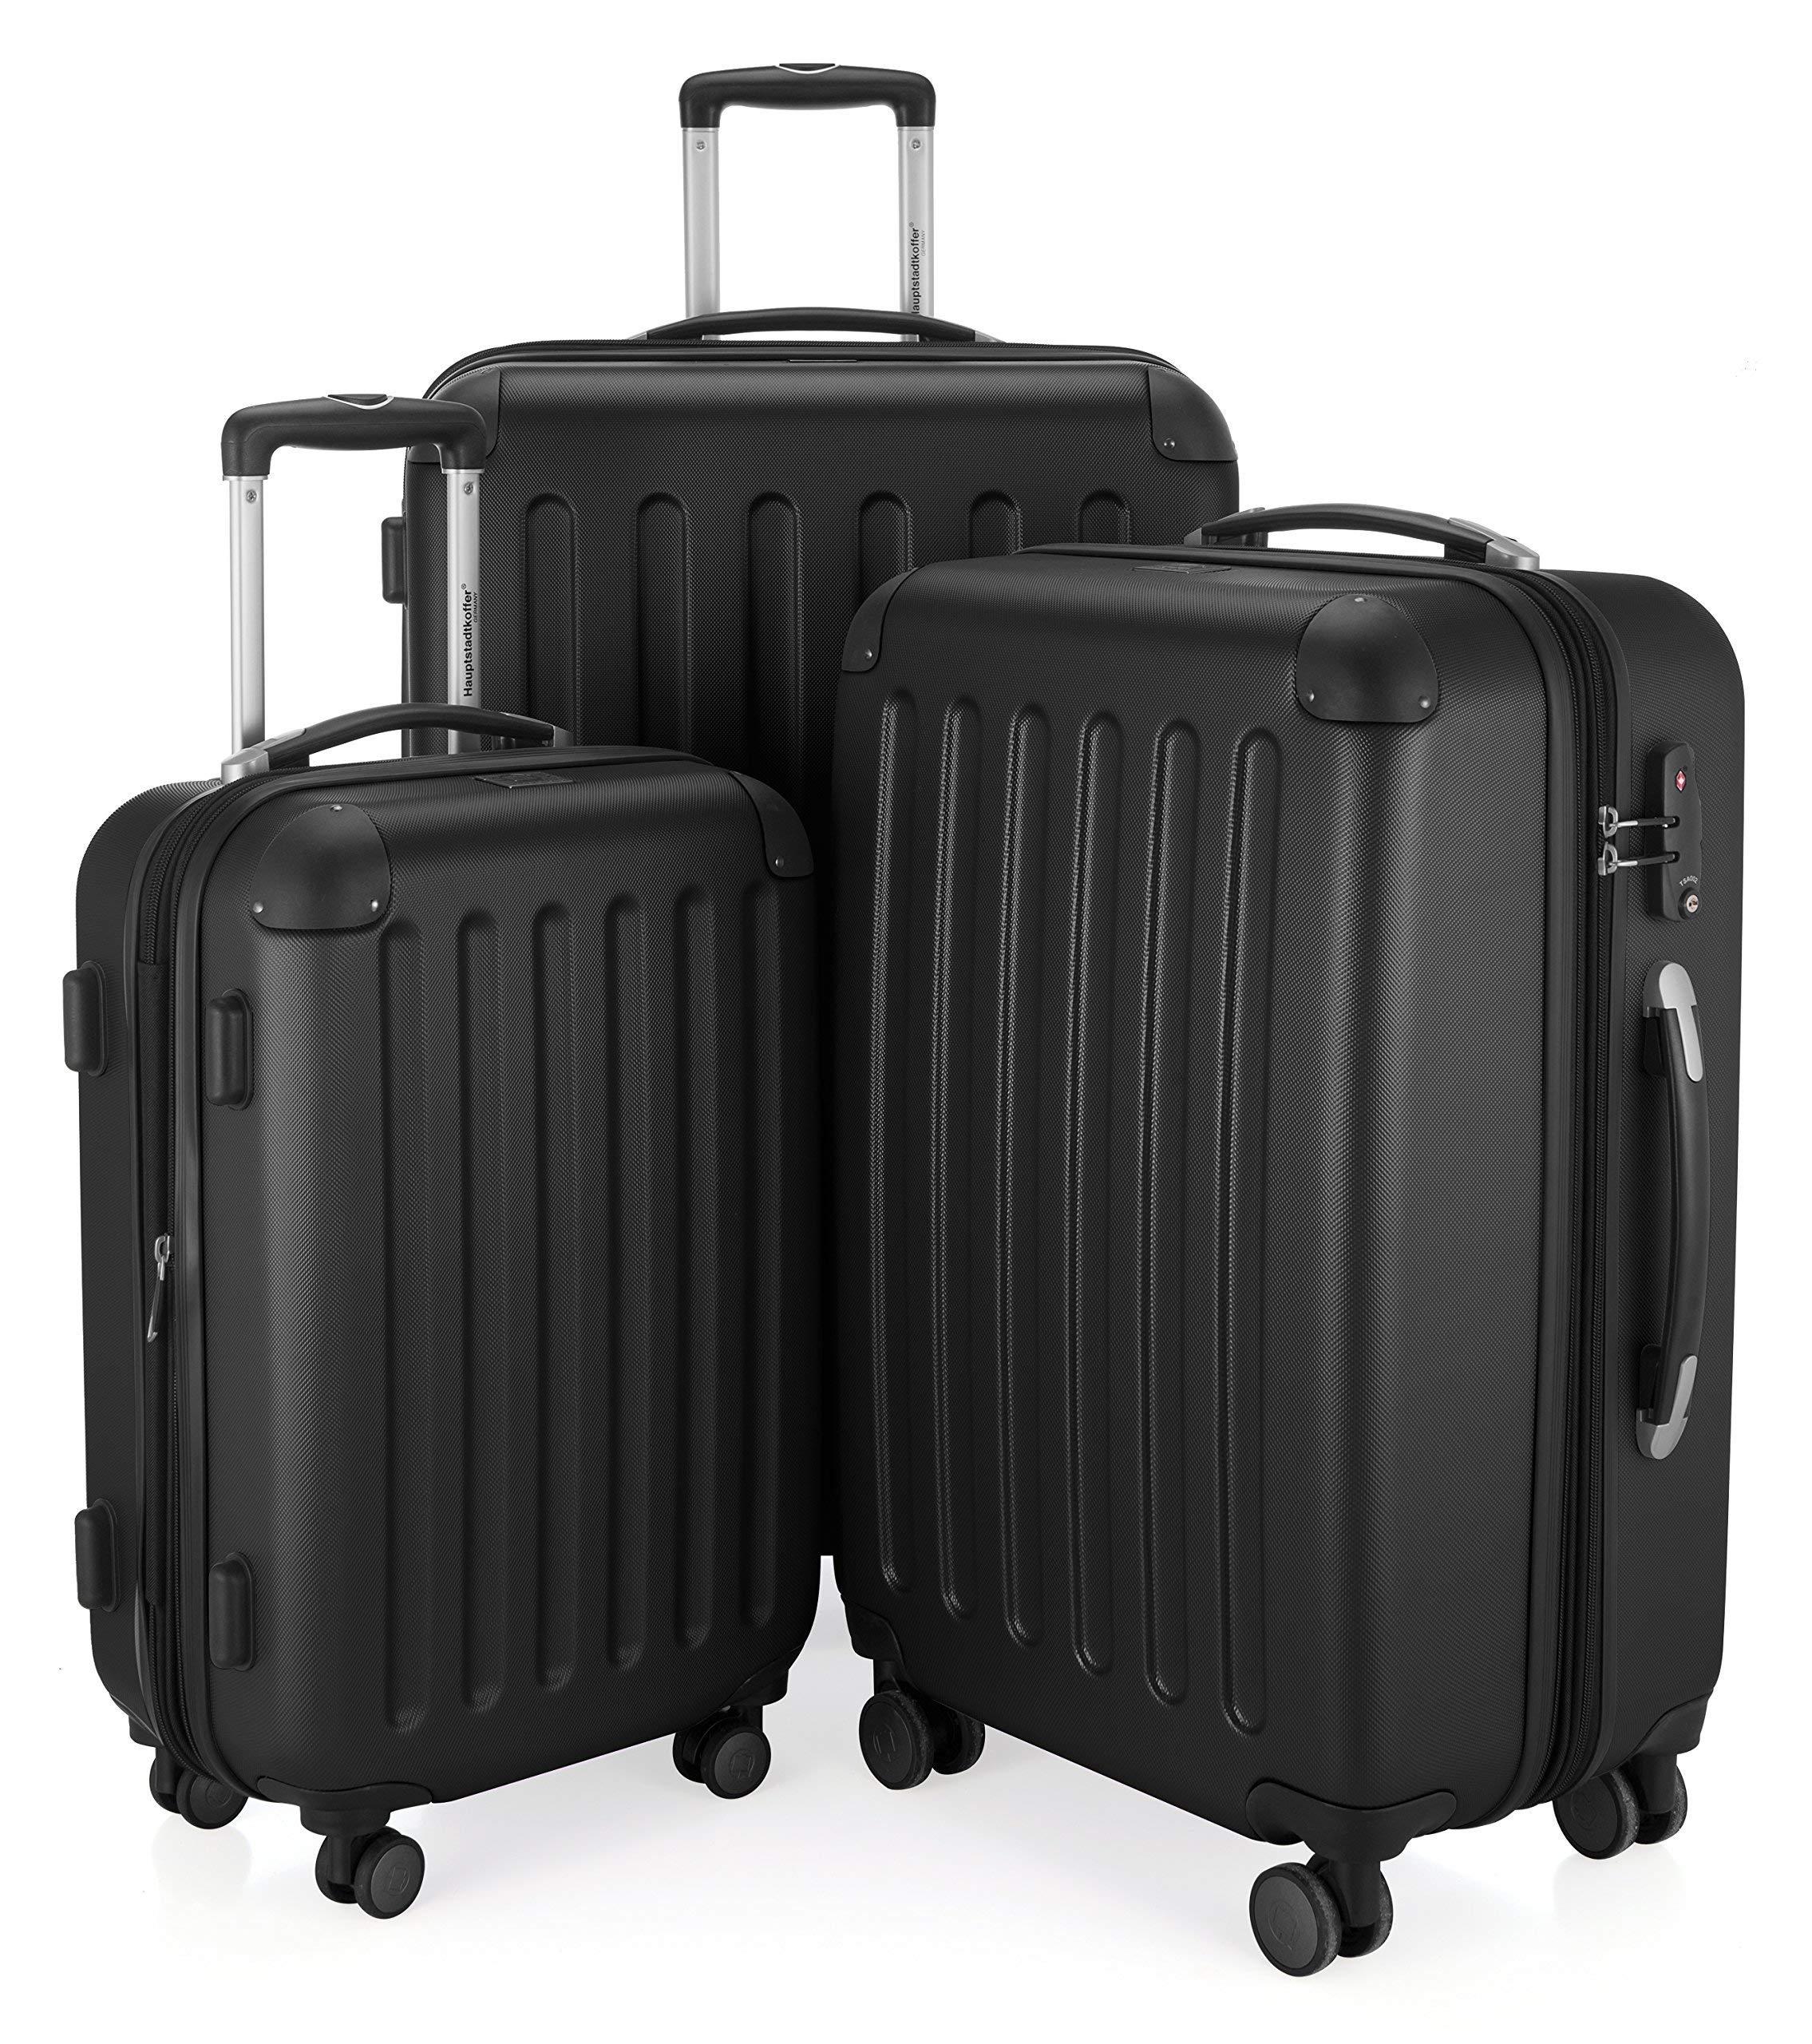 HAUPTSTADTKOFFER-Spree-3er-Koffer-Set-Trolley-Set-Rollkoffer-Reisekoffer-Erweiterbar-TSA-4-Rollen-S-M-L-Schwarz